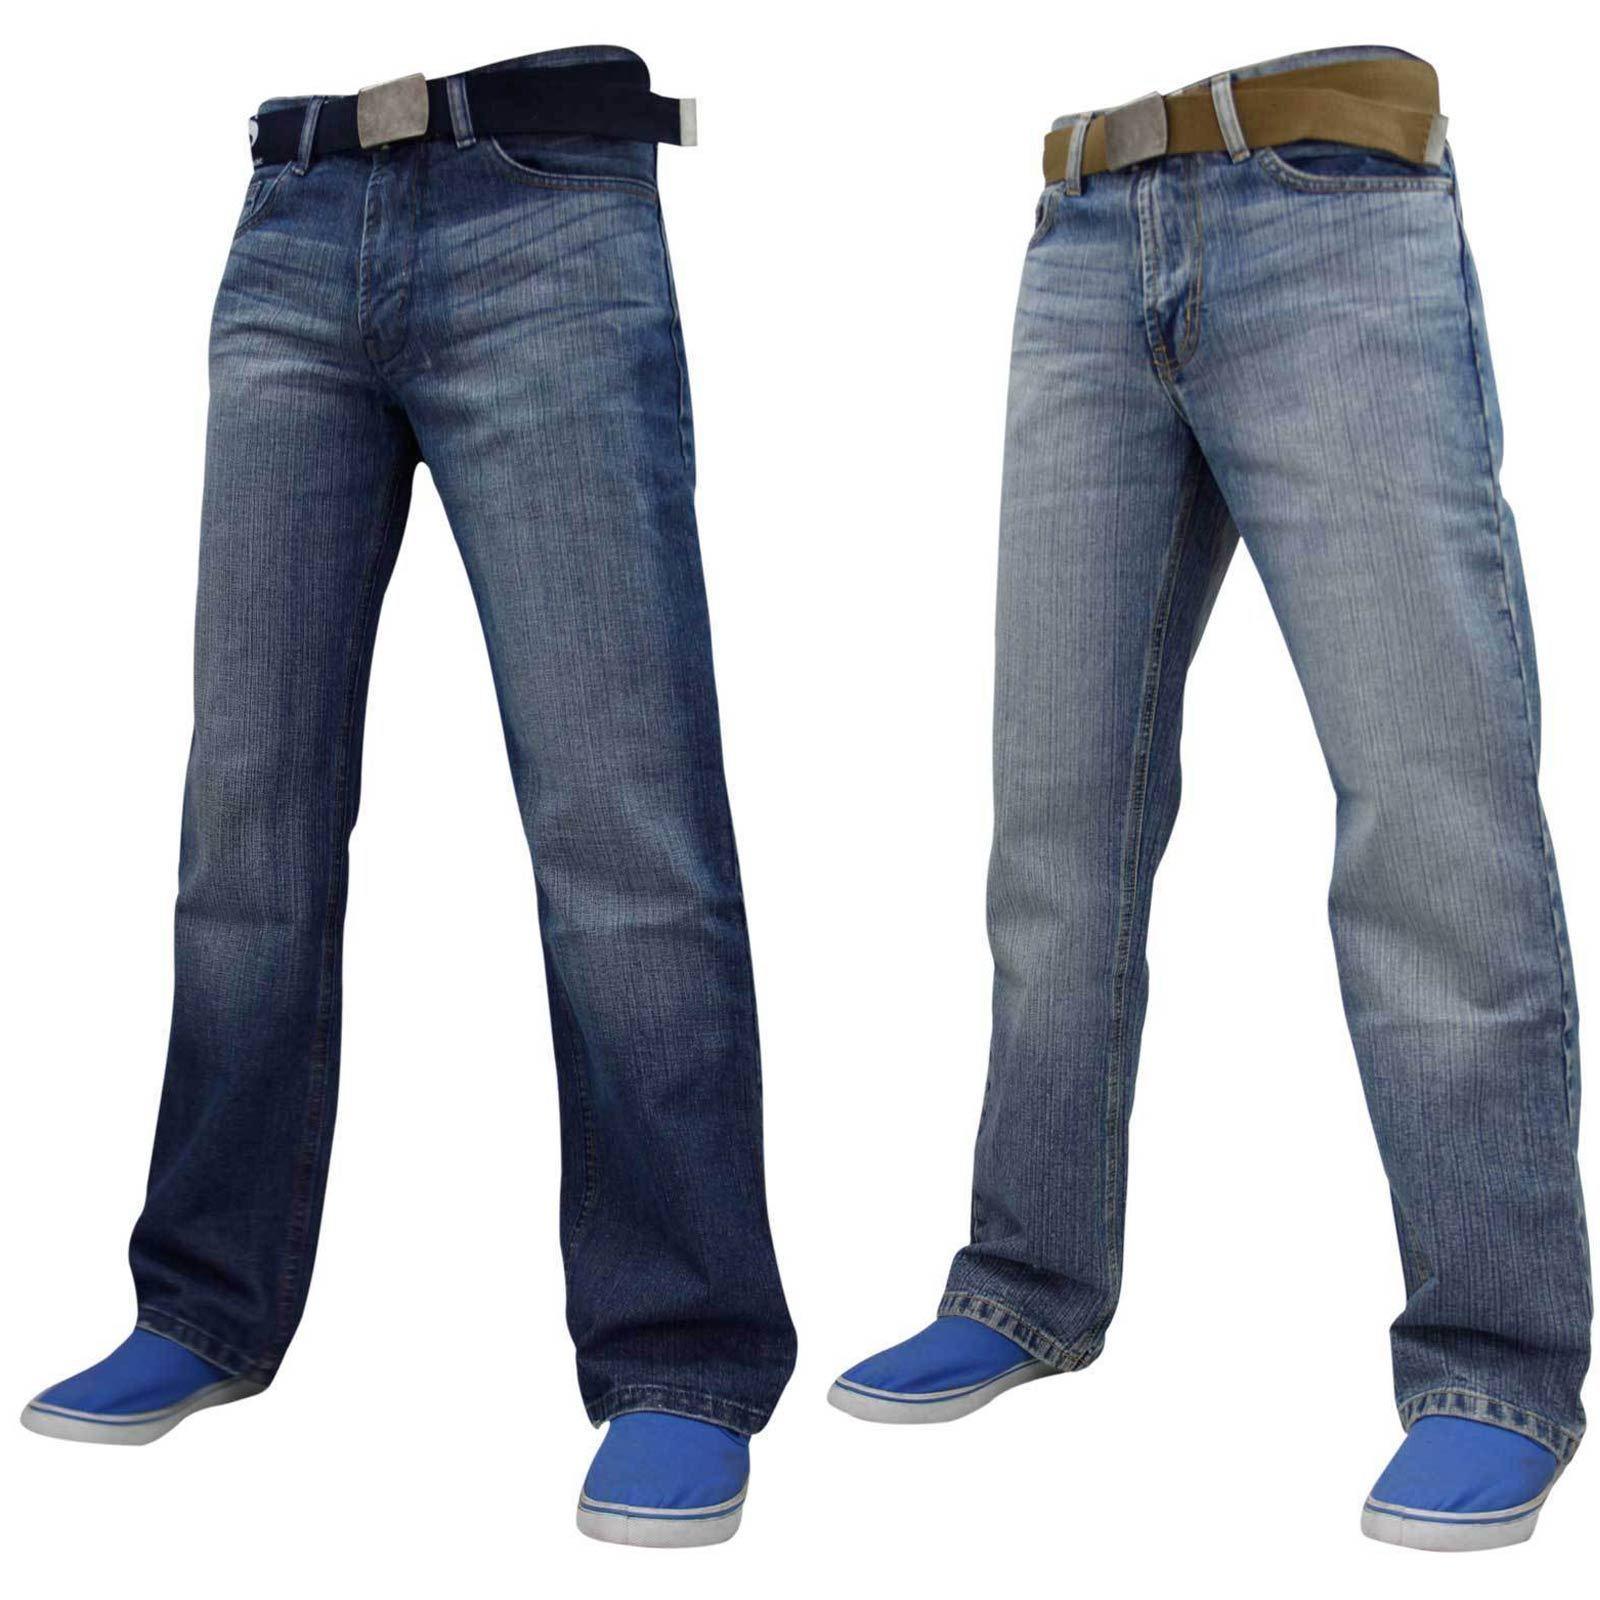 Crosshatch Jeans Denim Uomo Chiusura Zip Regular Fit Pantaloni Pantaloni Taglie Big /& Tall